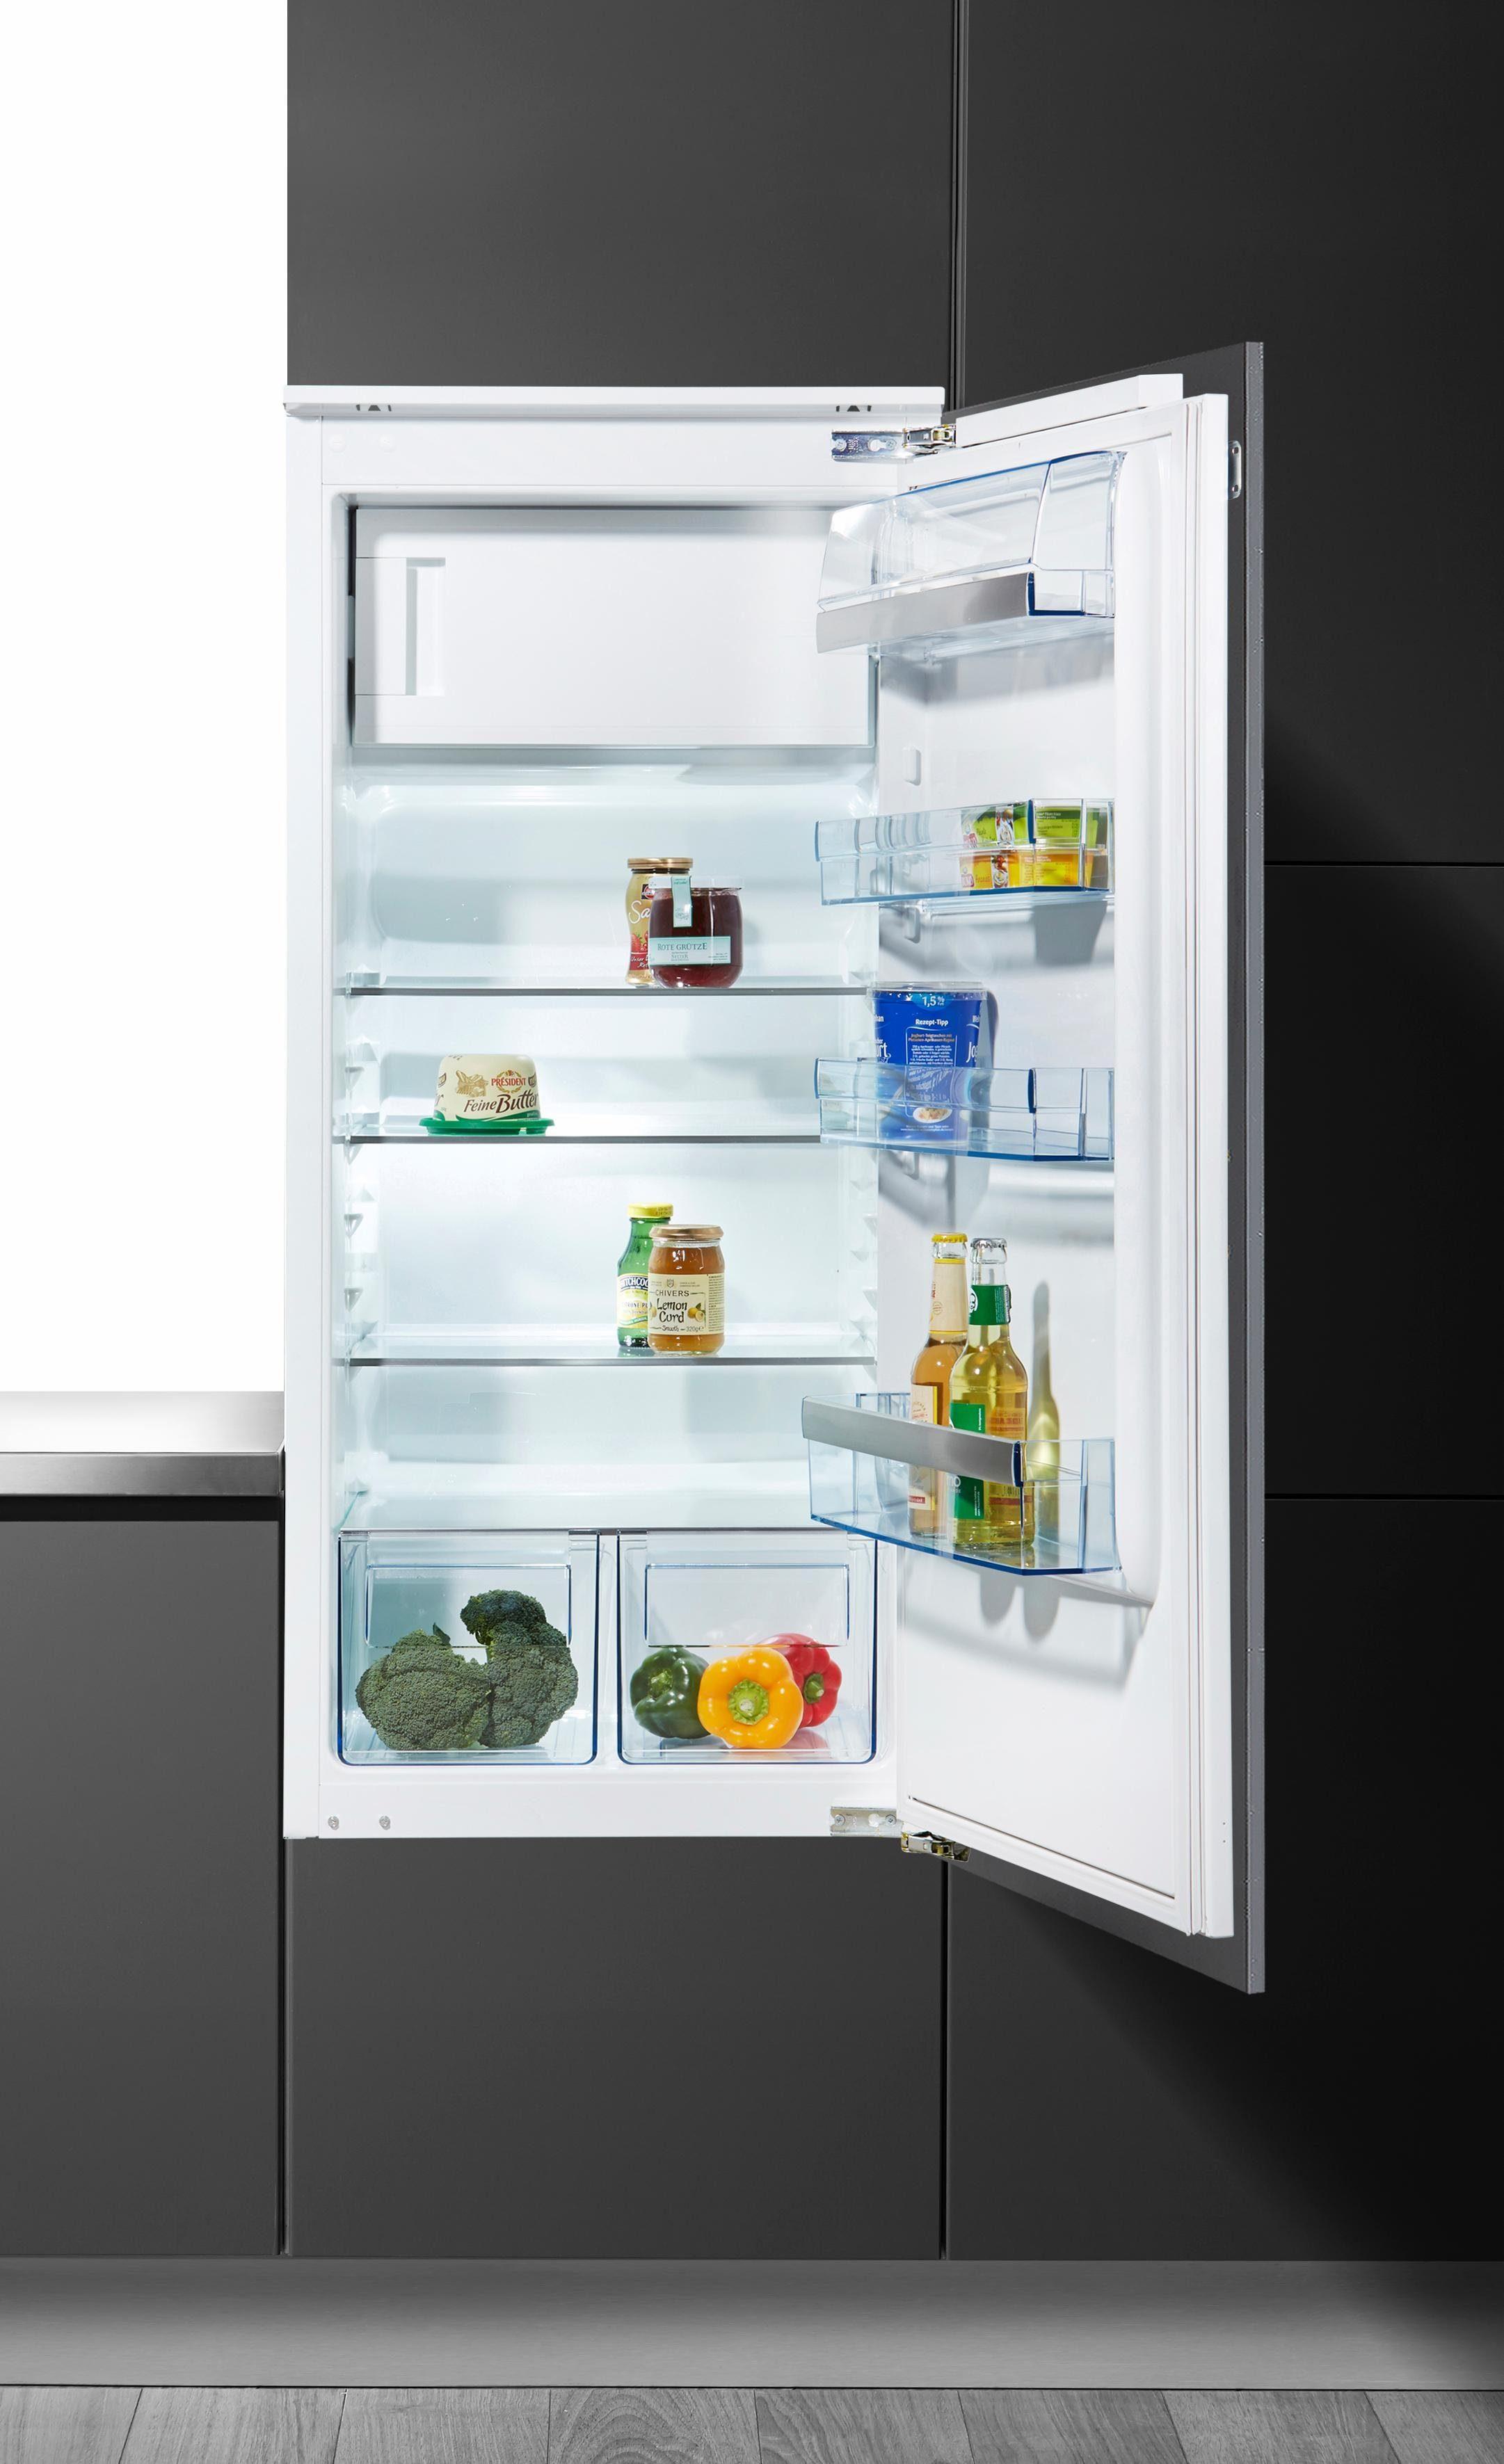 AEG Kühlschrank integrierbar SANTO / SKS51240F2, Energieklasse A+